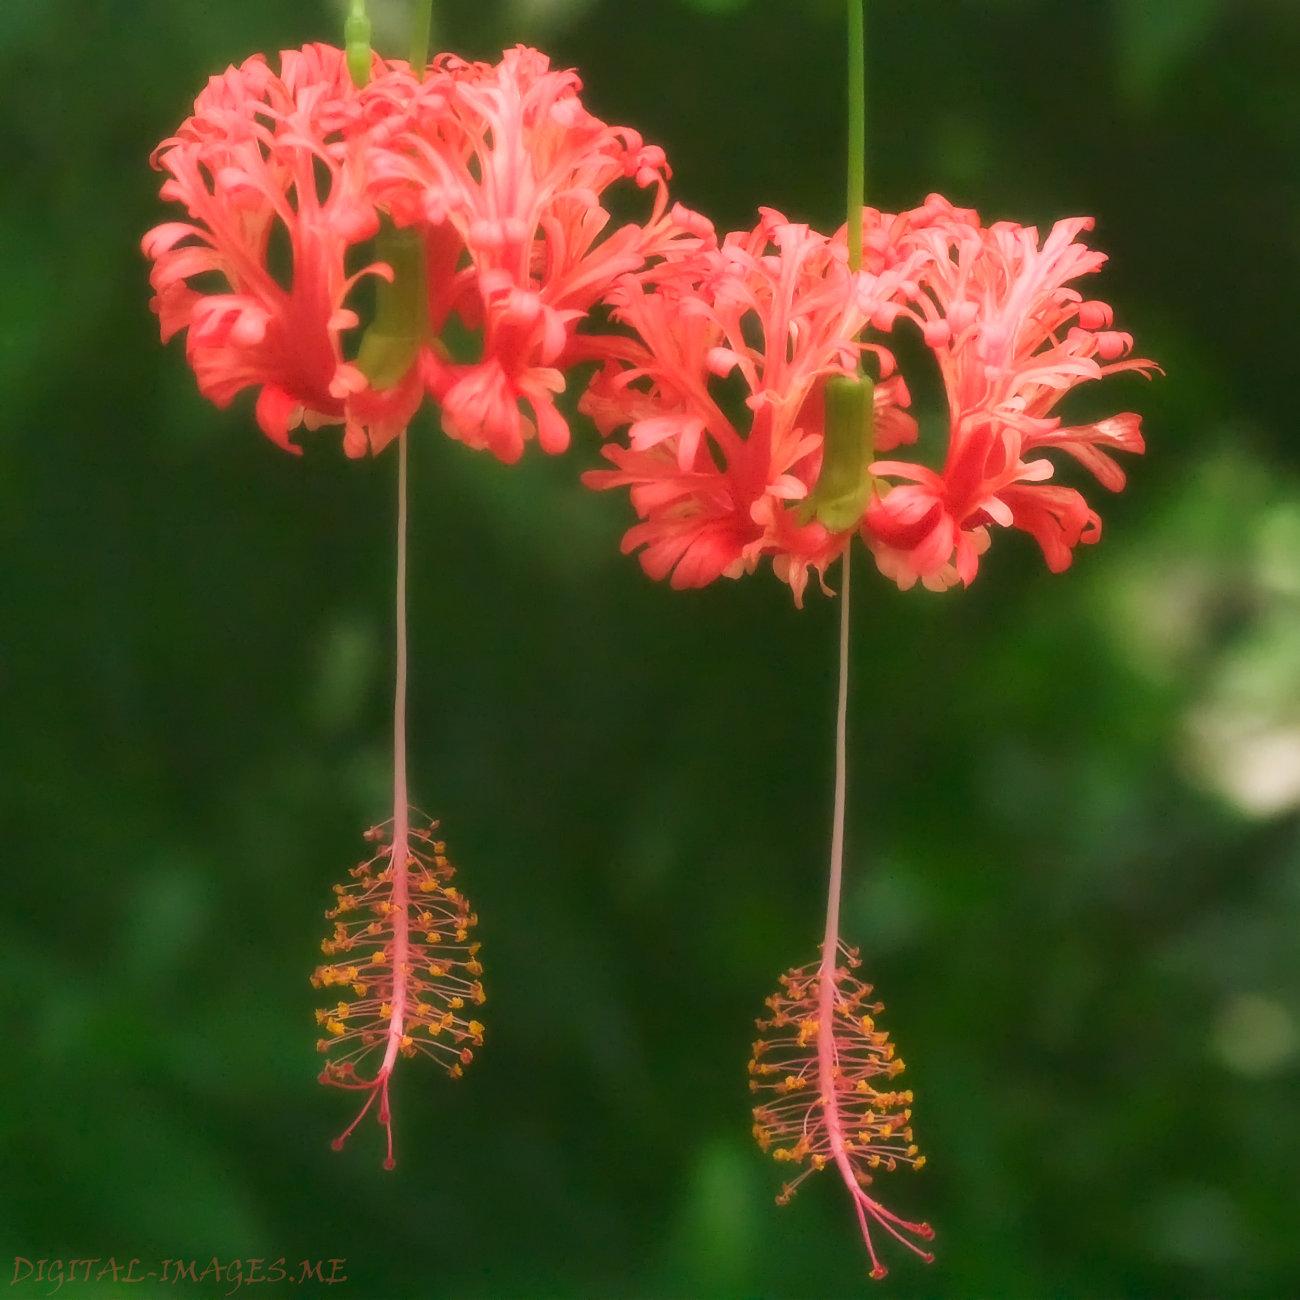 Eden Project Flower